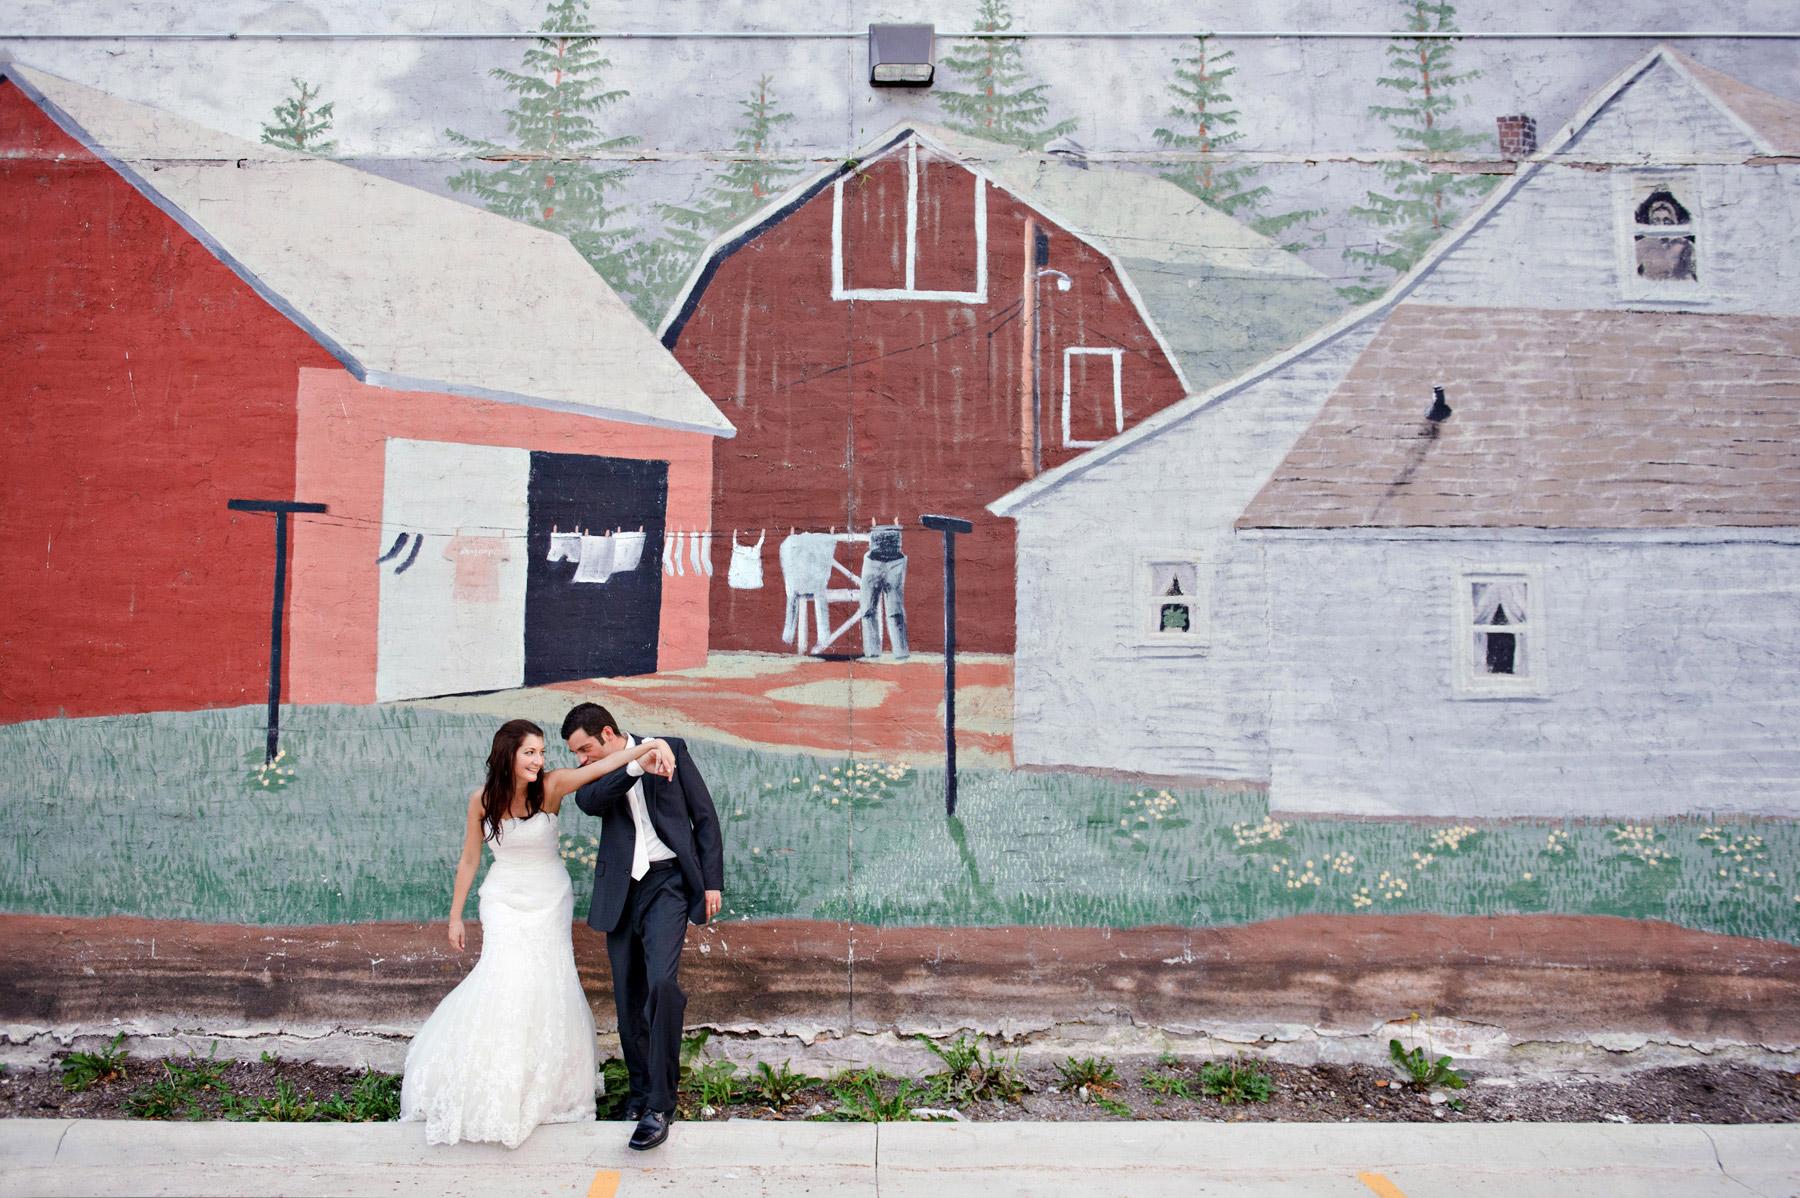 minnesota-wedding-photographers-mark-kegans-958.jpg